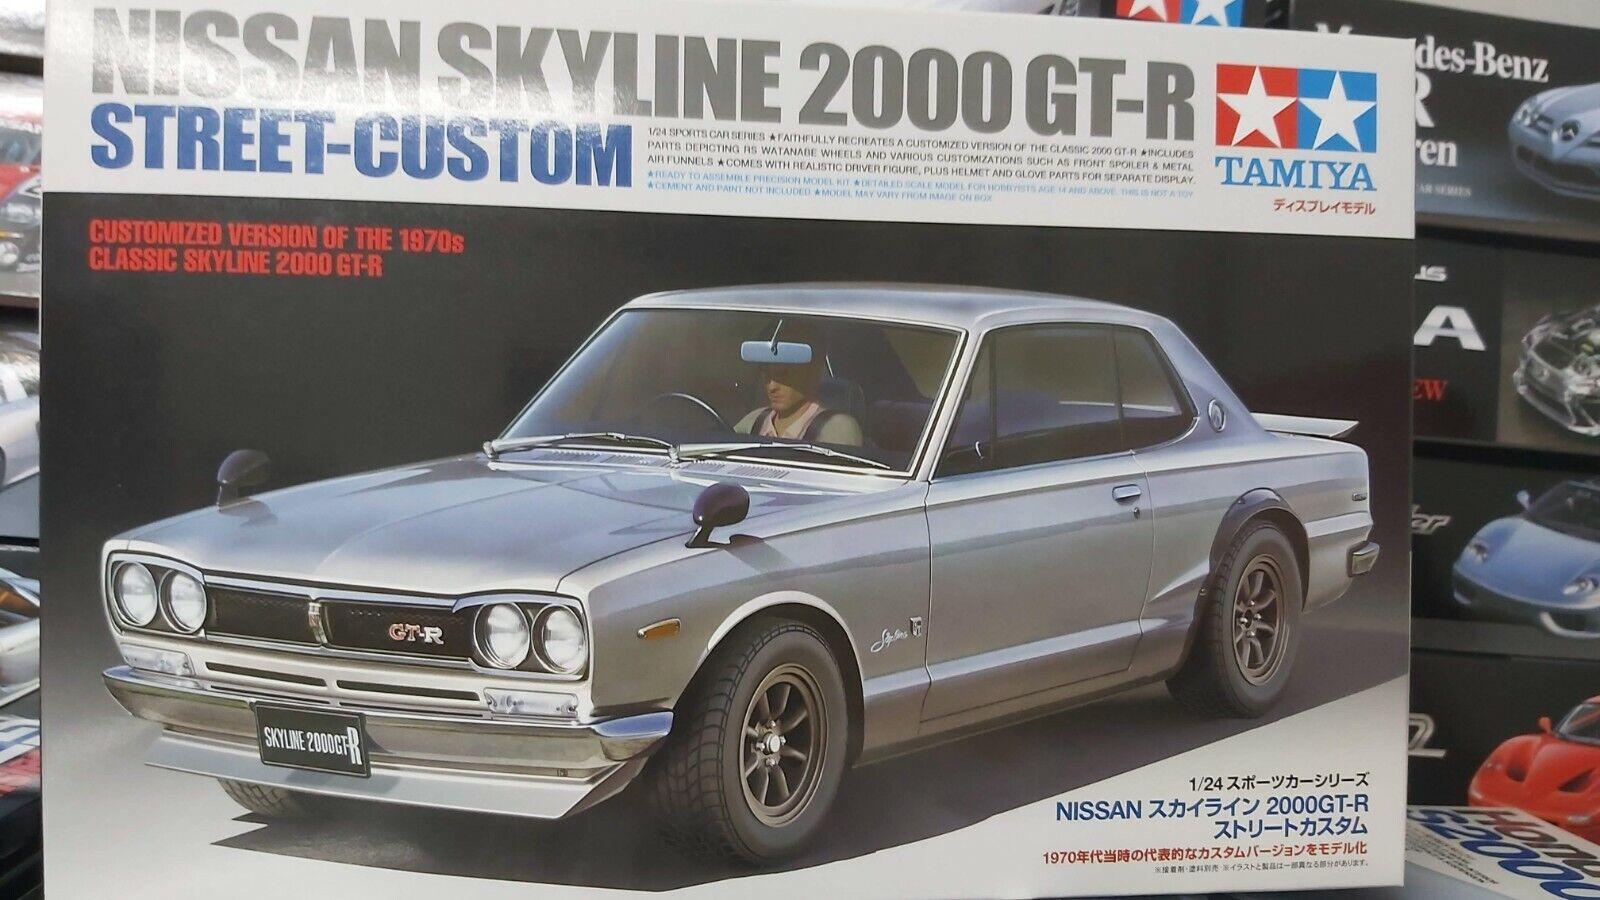 Tamiya Nissan Skyline 2000 GT-R Street Custom Car Model Set Scale 1:24 24335 New